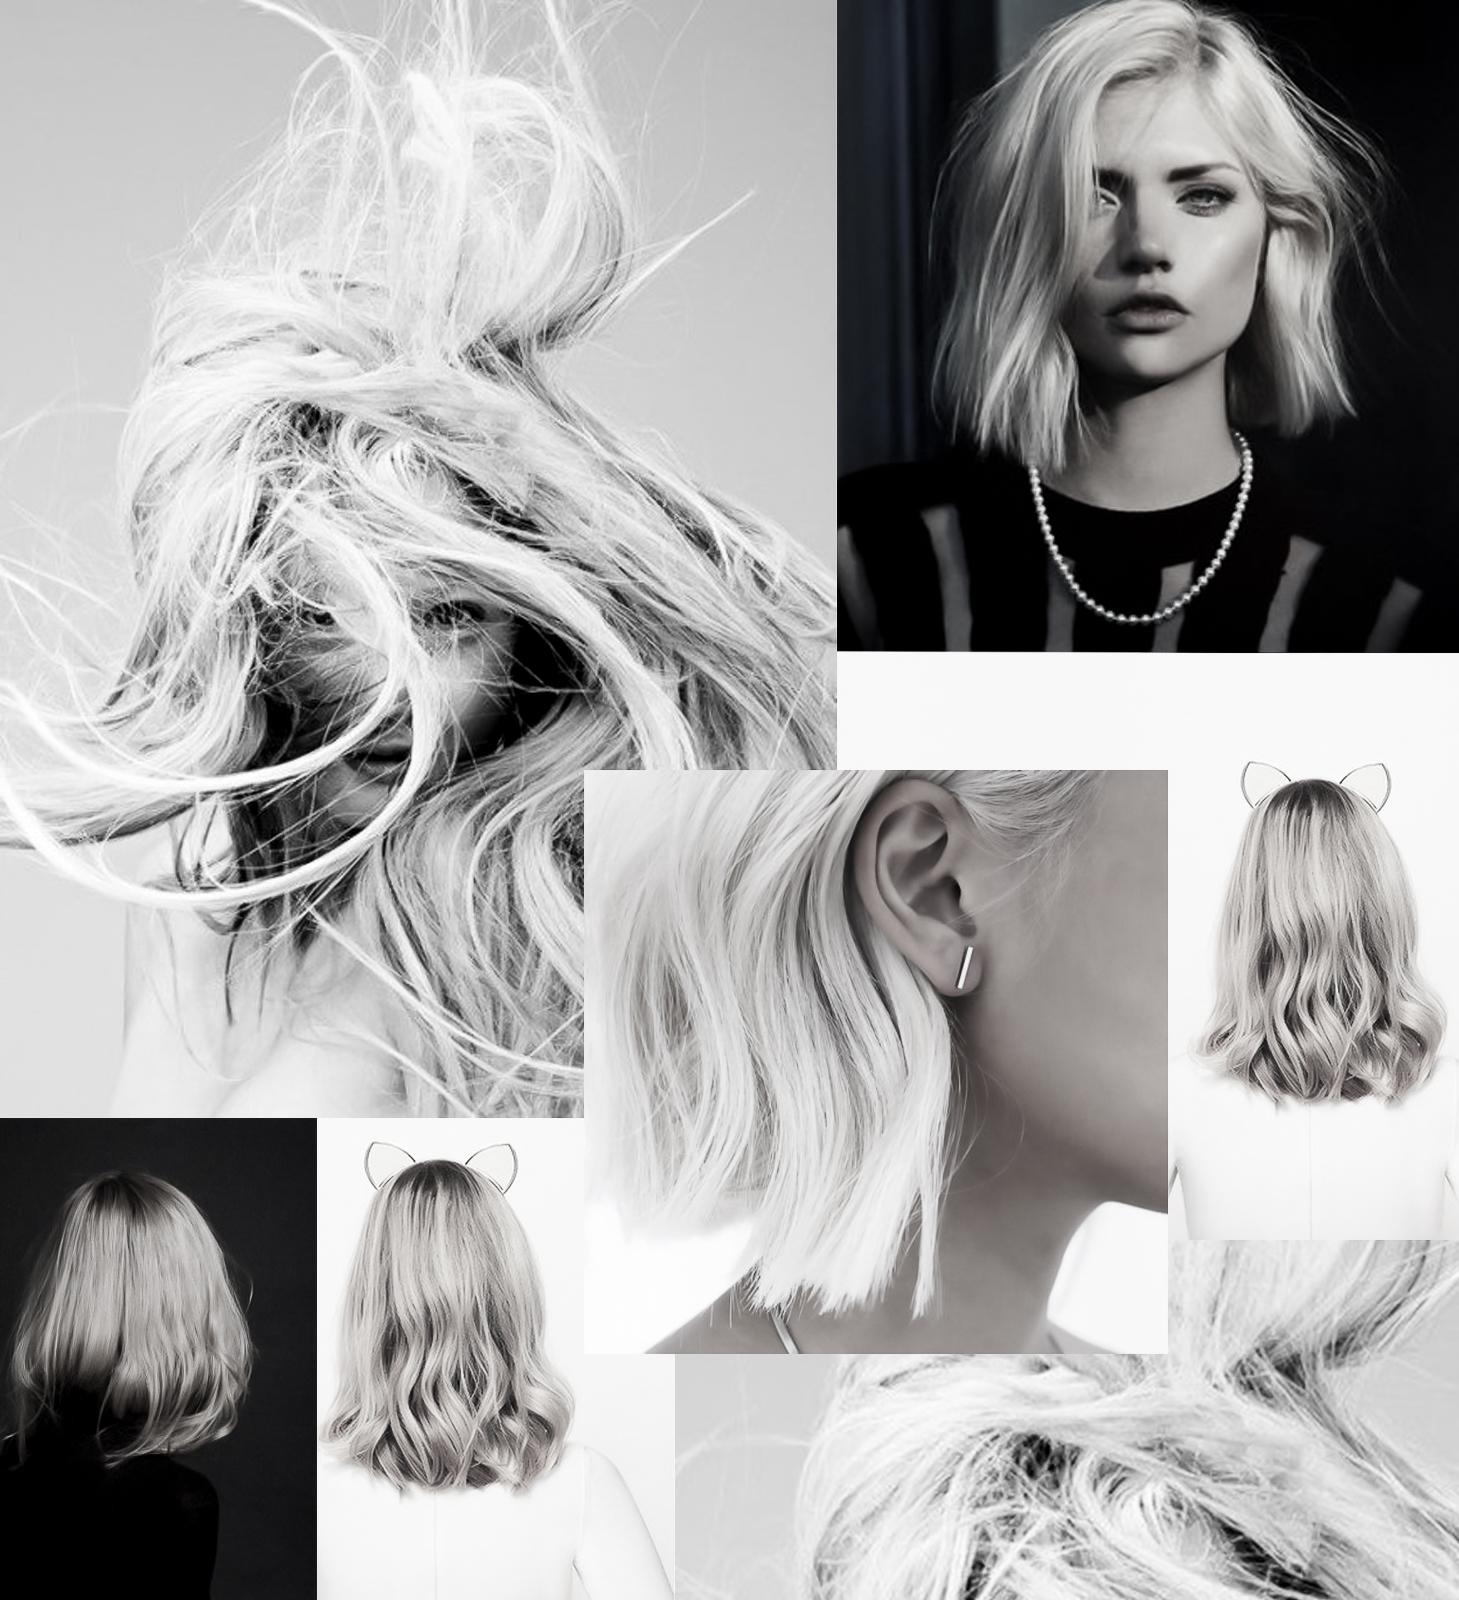 hair_isnpiration_clavicut_longbob_blond_zukkermaedchen